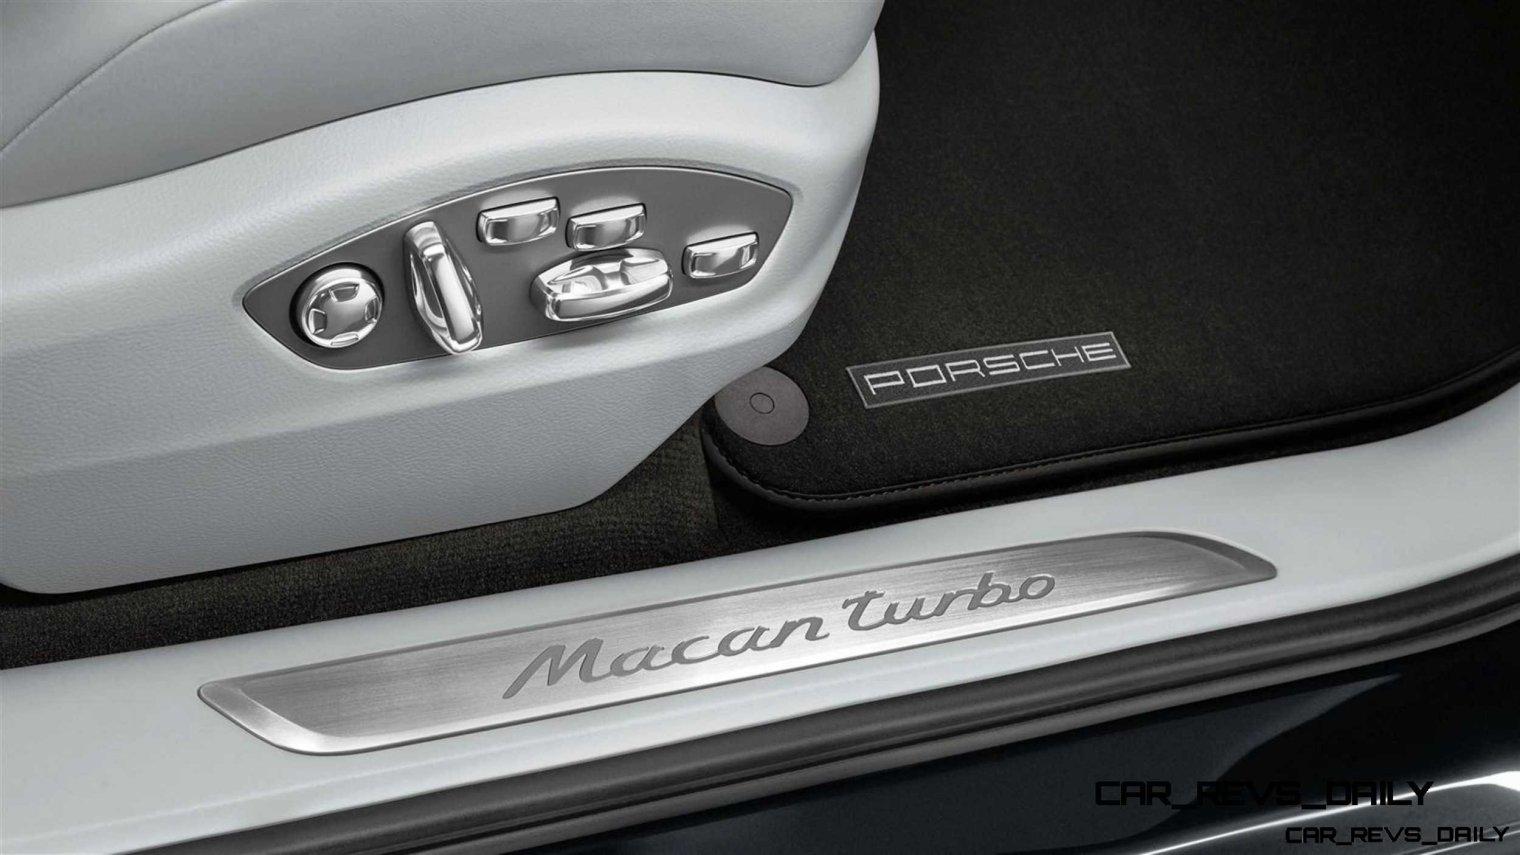 2015 Porsche Macan - Latest Images - CarRevsDaily.com 97